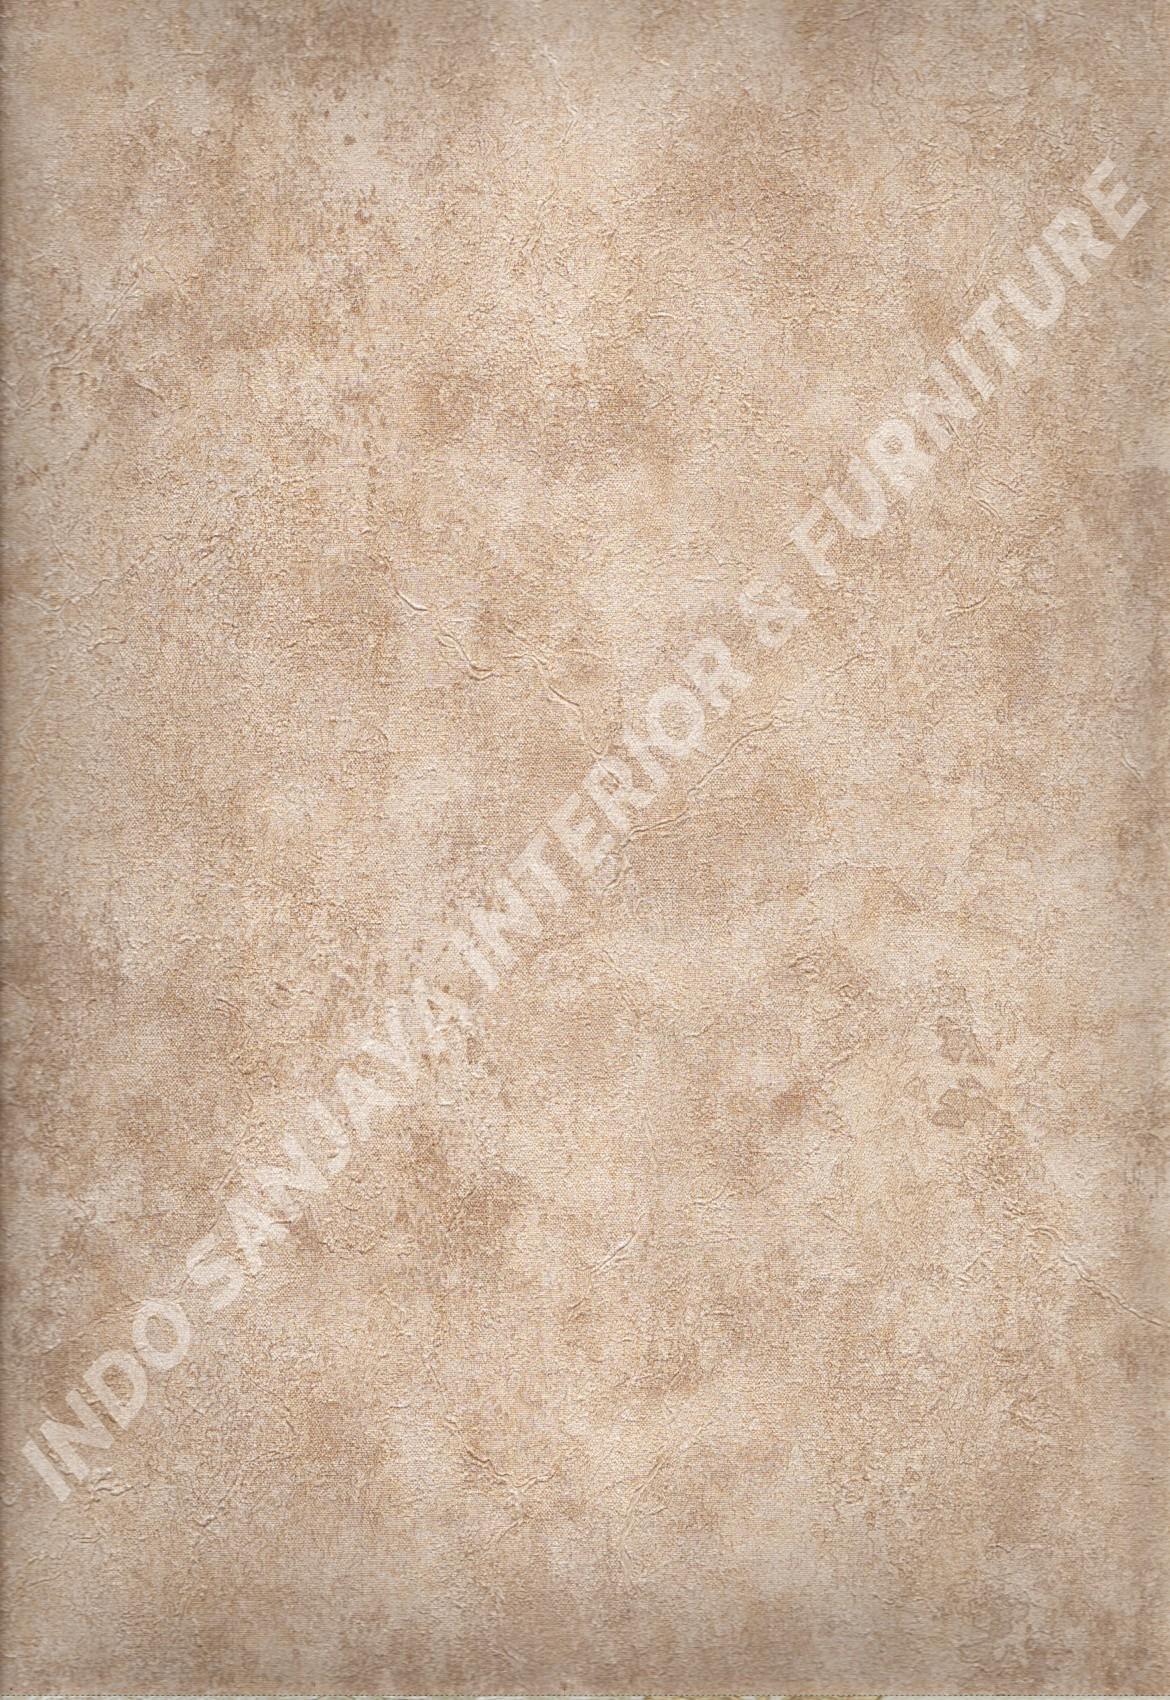 wallpaper   Wallpaper Minimalis Polos DL12006:DL12006 corak  warna